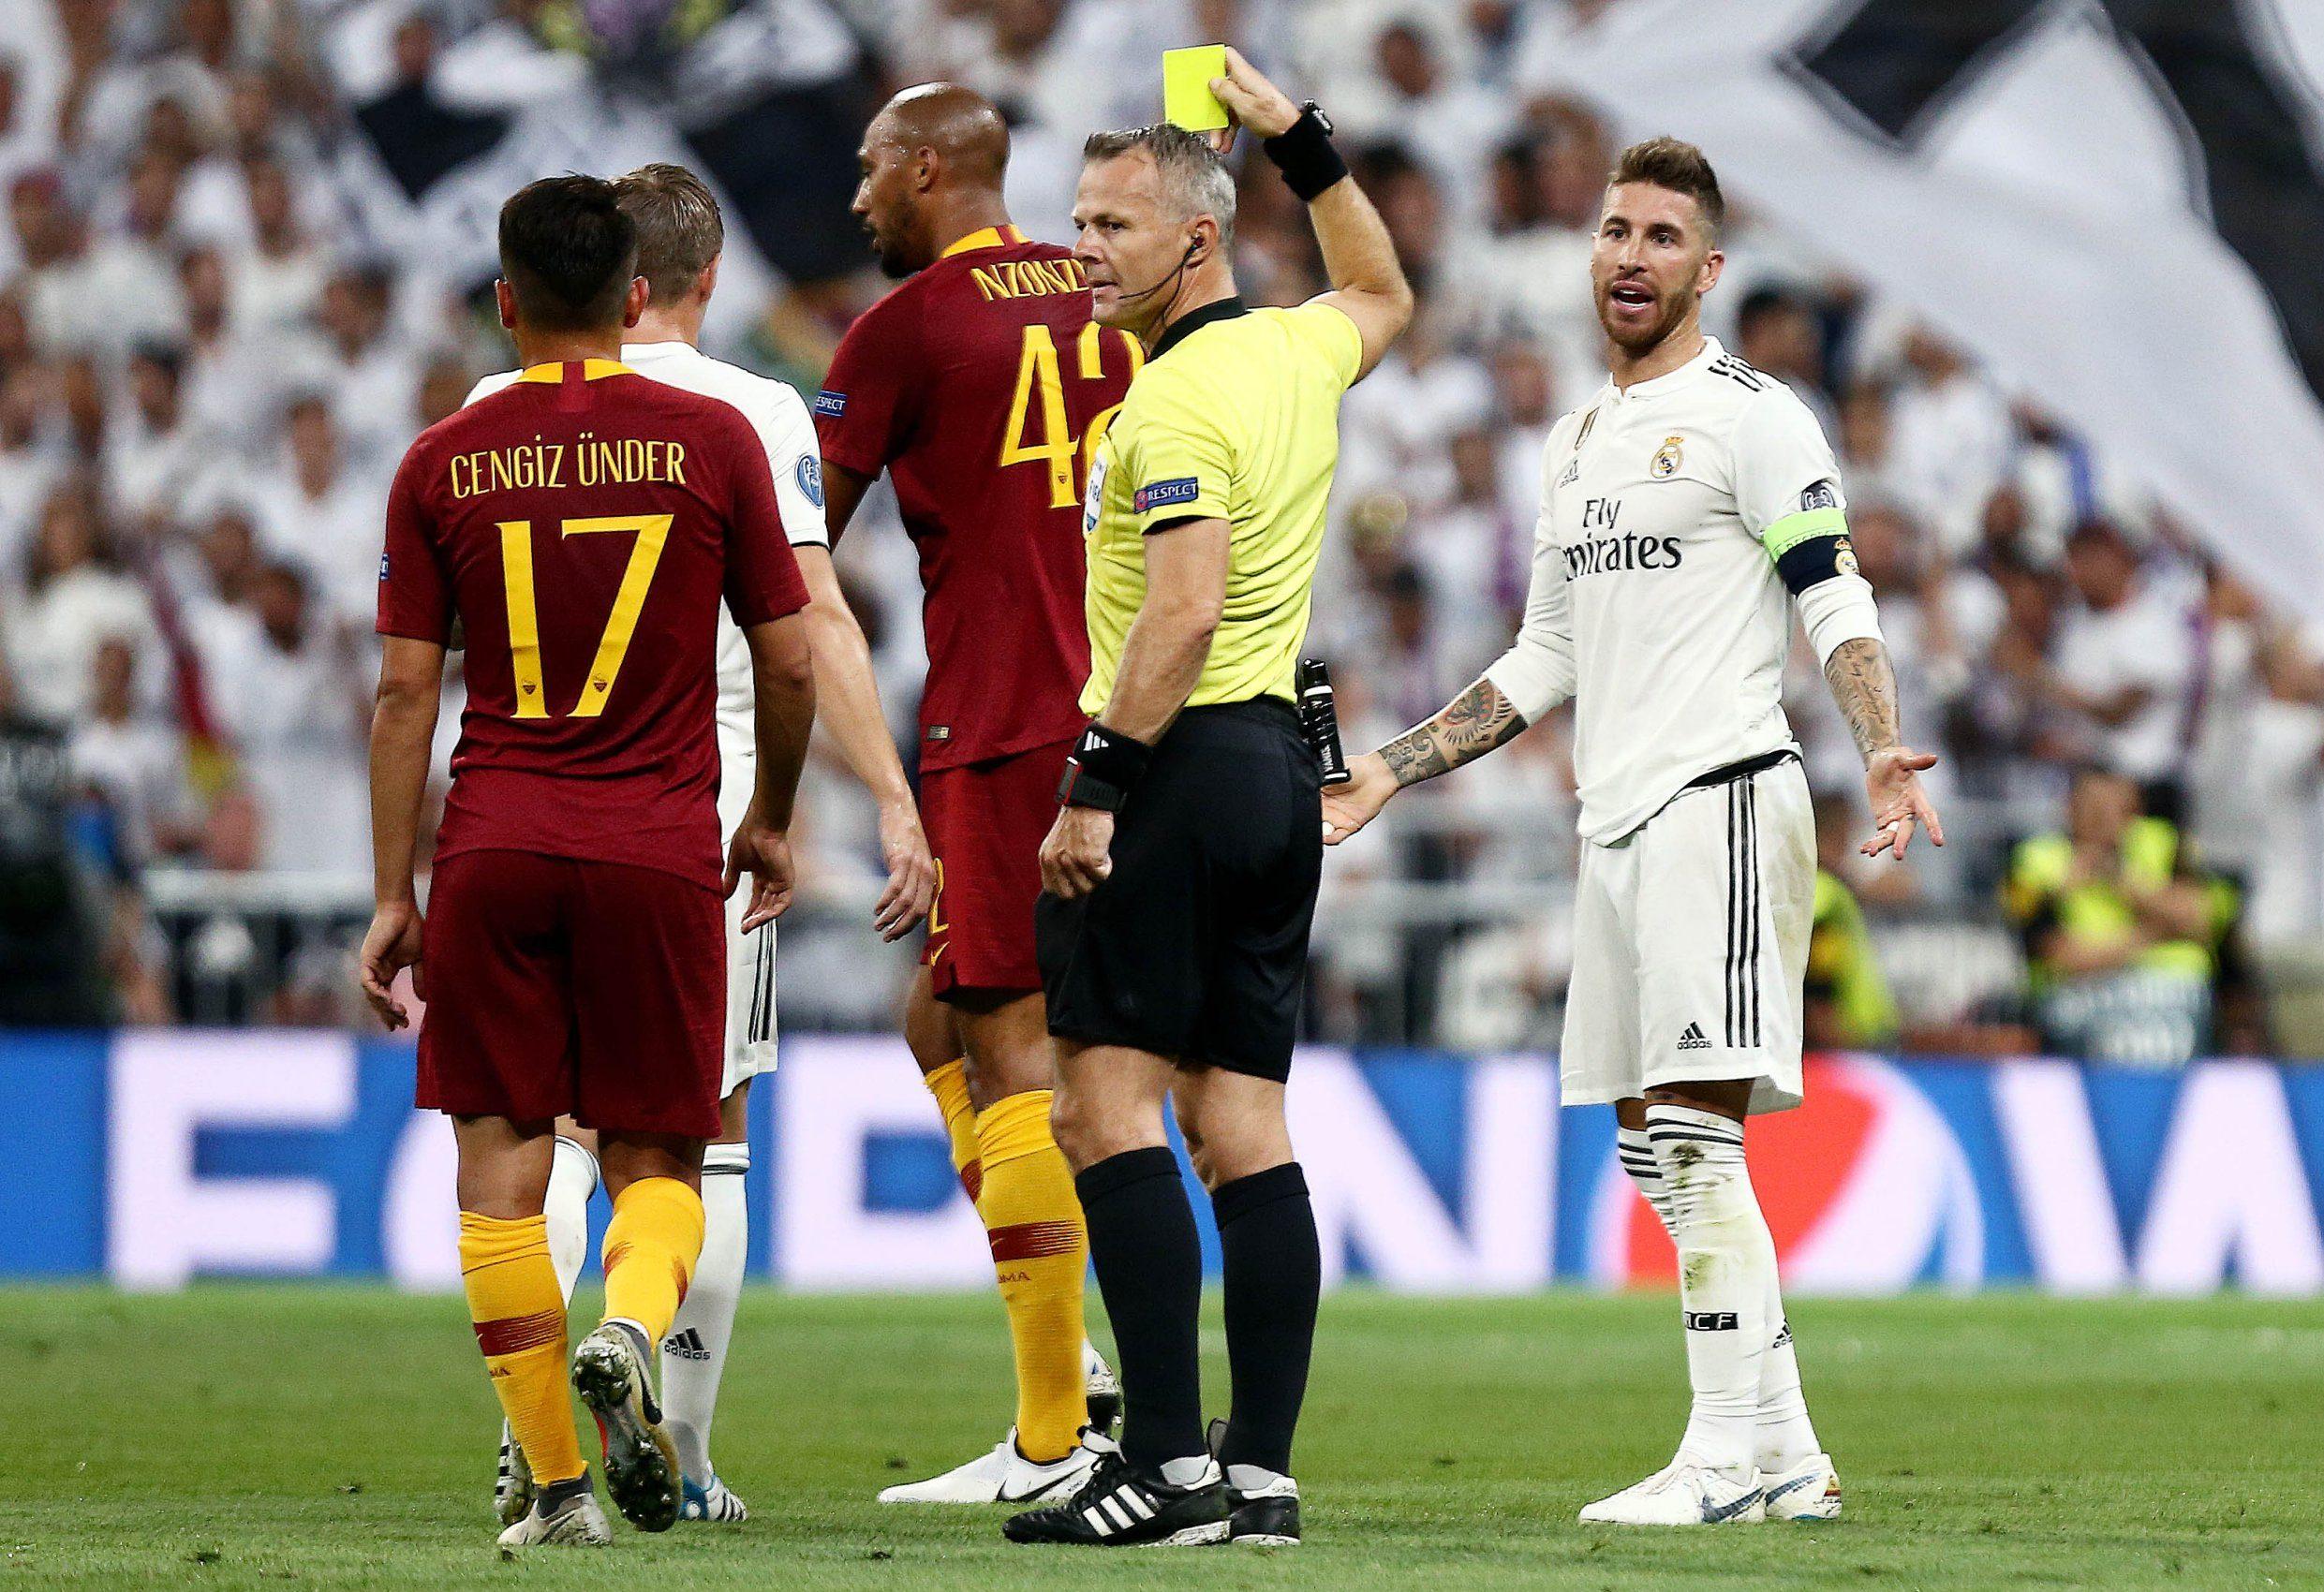 Mandatory Credit: Photo by James Marsh/BPI/REX (9887113j) Sergio Ramos of Real Madrid is shown a yellow card. Real Madrid v AS Roma, Group G, UEFA Champions League, Santiago Bernabeu Stadium, Madrid, Spain - 19 Sep 2018